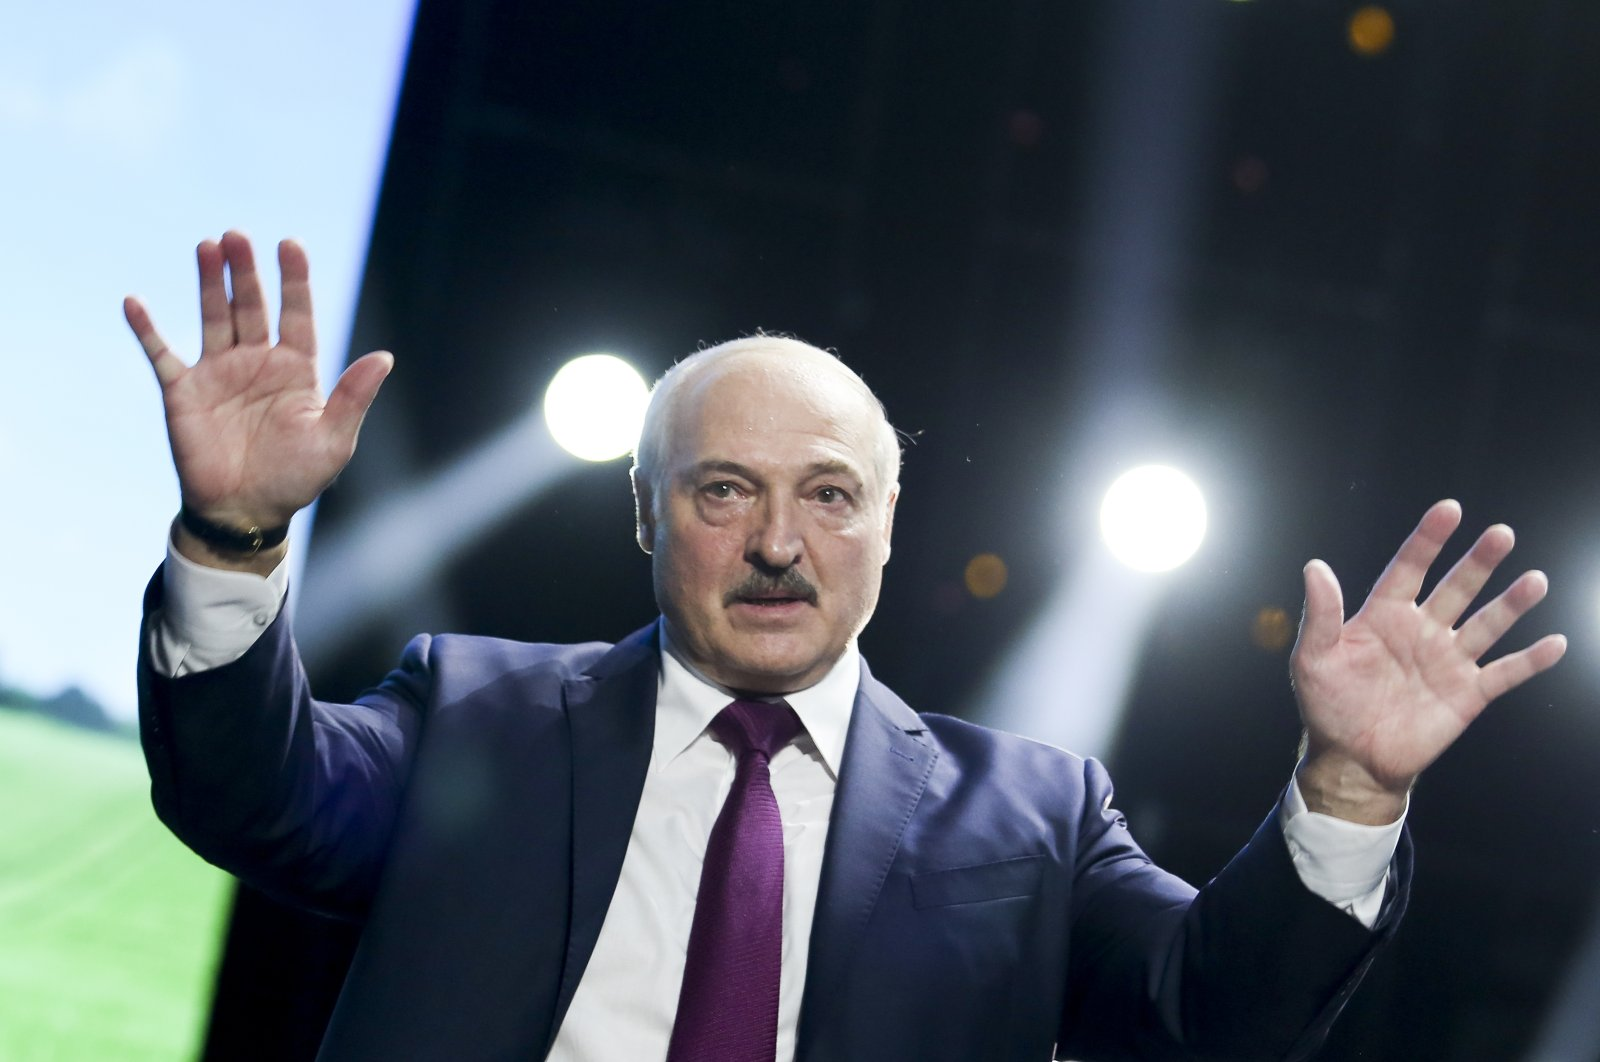 Belarusian President Alexander Lukashenko gestures as he addresses a women's forum in Minsk, Belarus, Sept. 17, 2020. (TUT.by via AP)